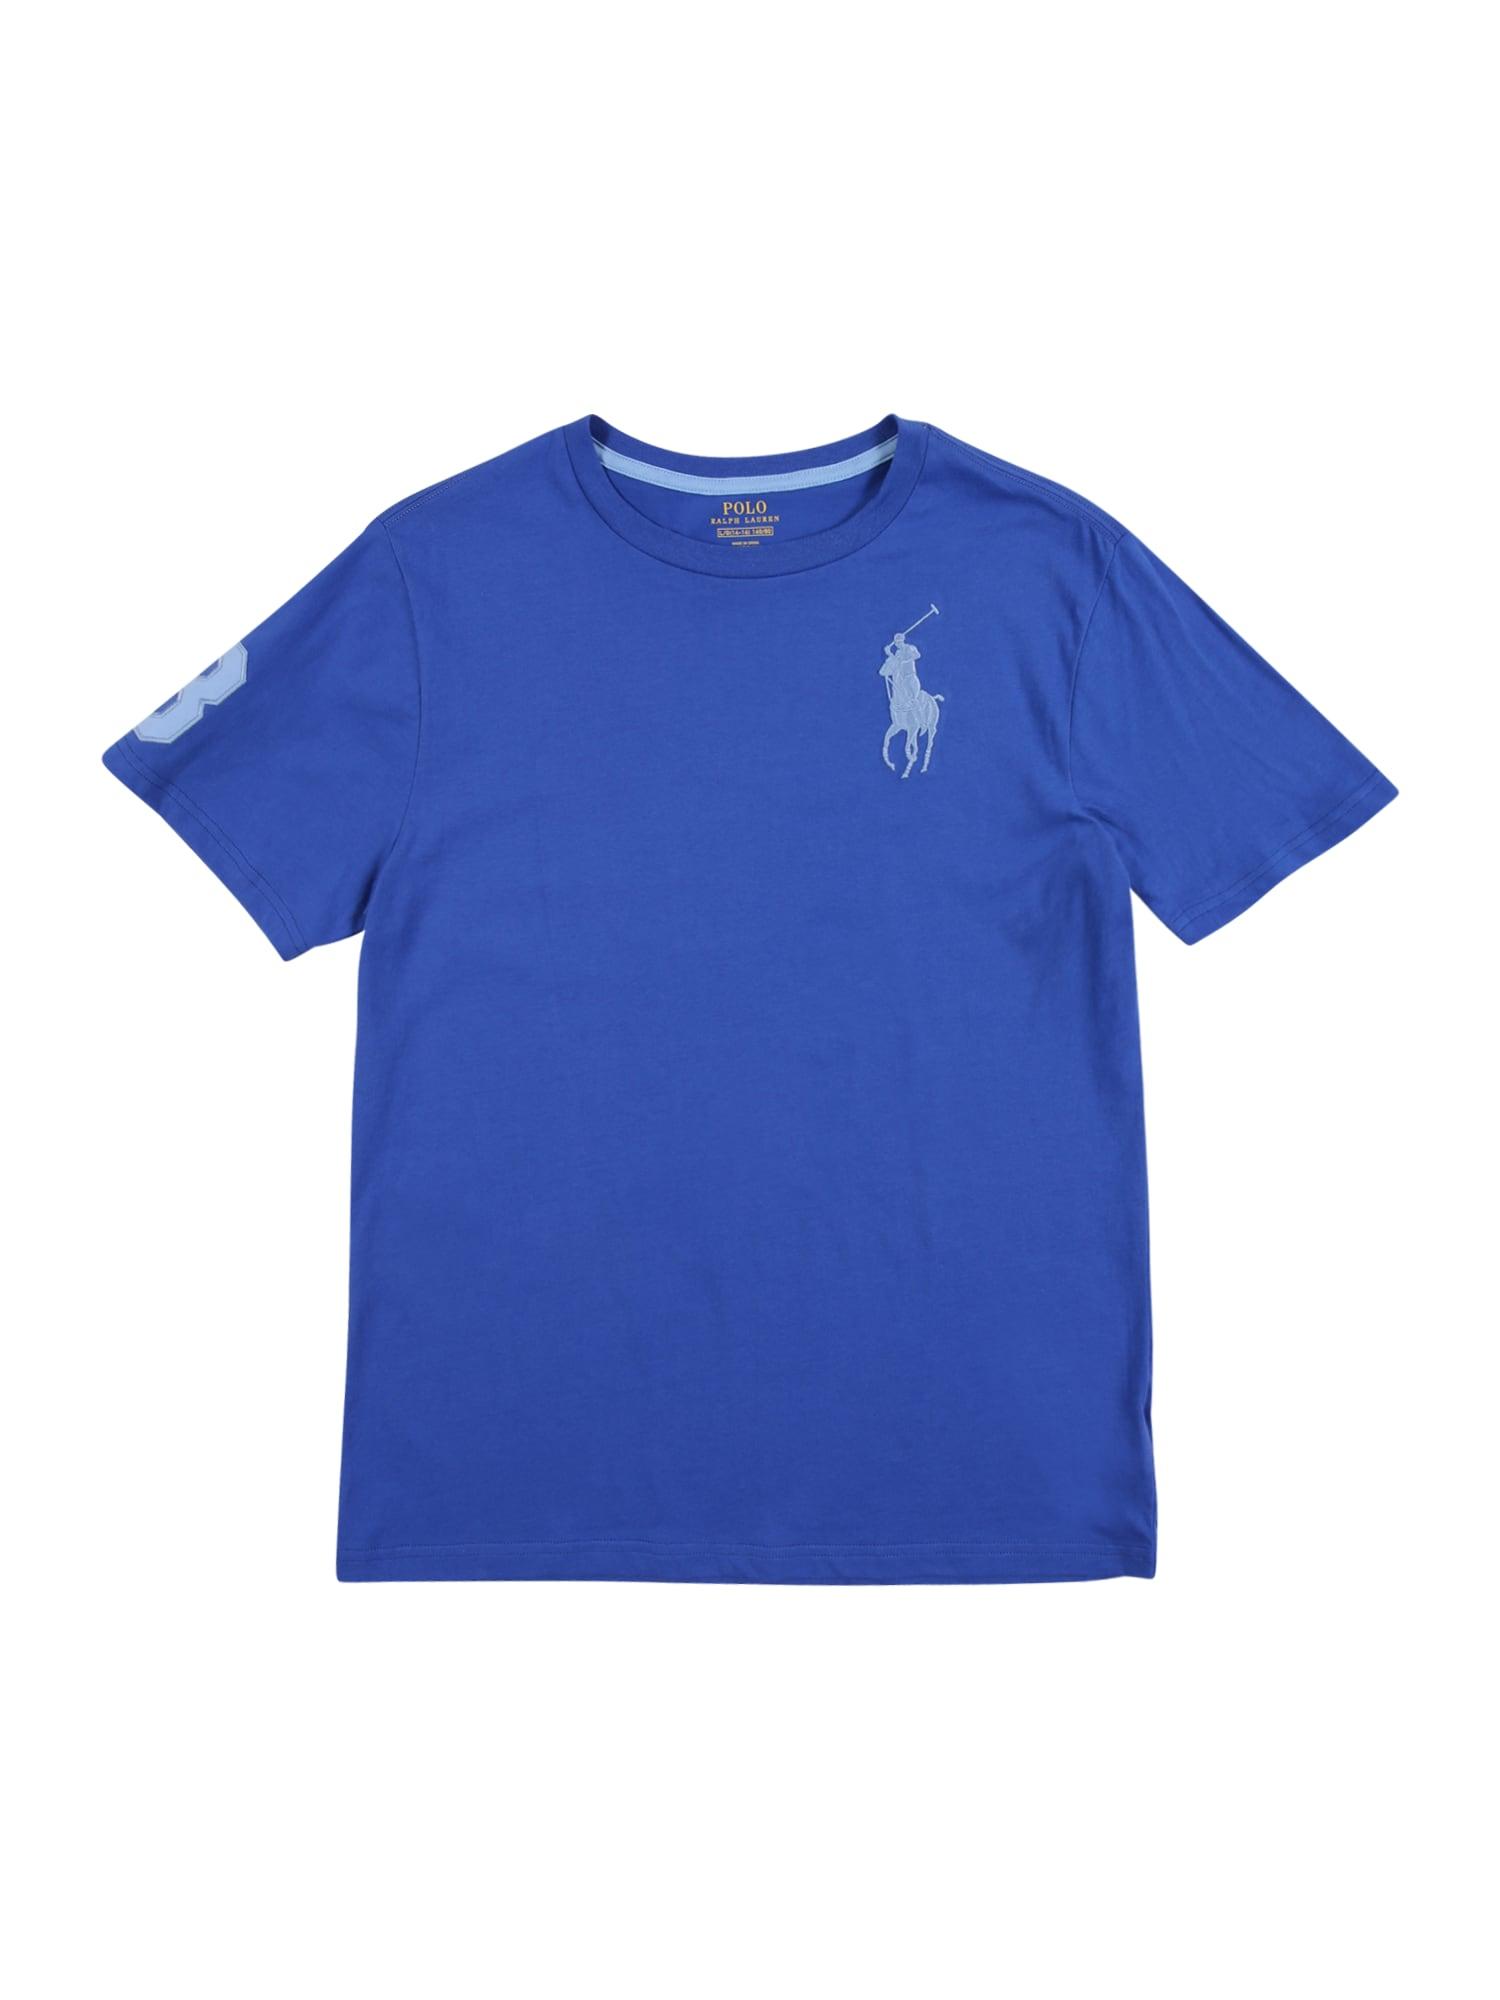 POLO RALPH LAUREN Tričko  tmavě modrá / světlemodrá